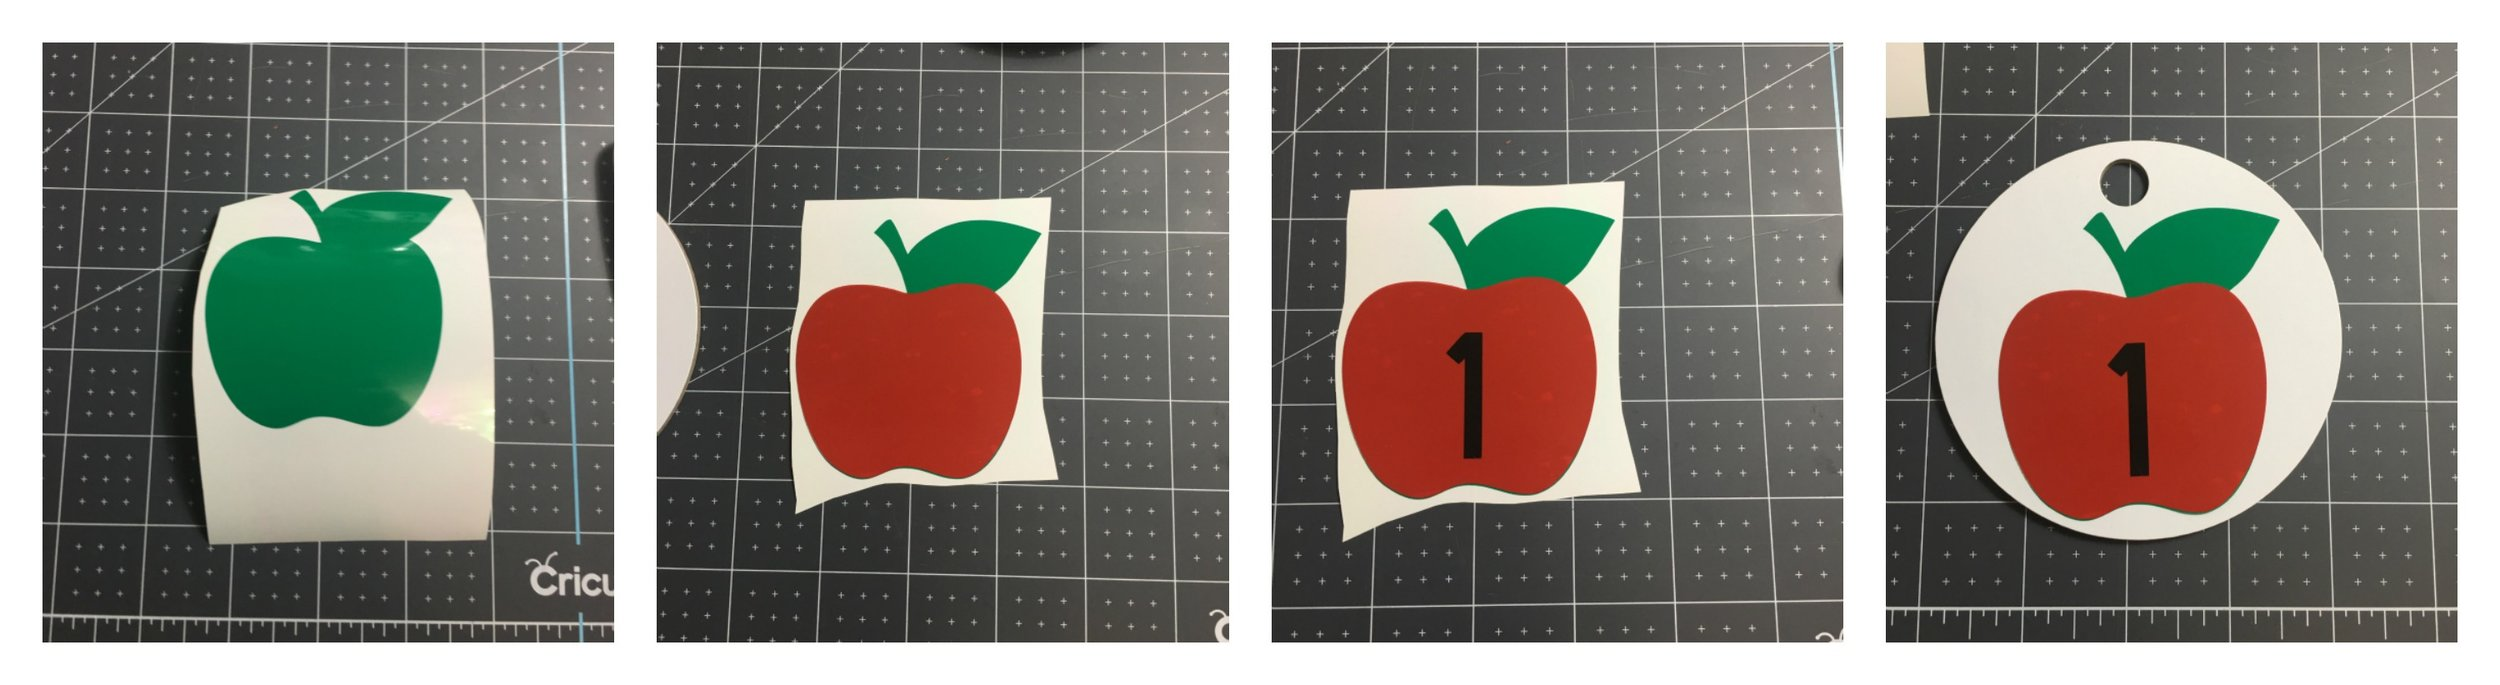 PicMonkey Collage-14.jpg